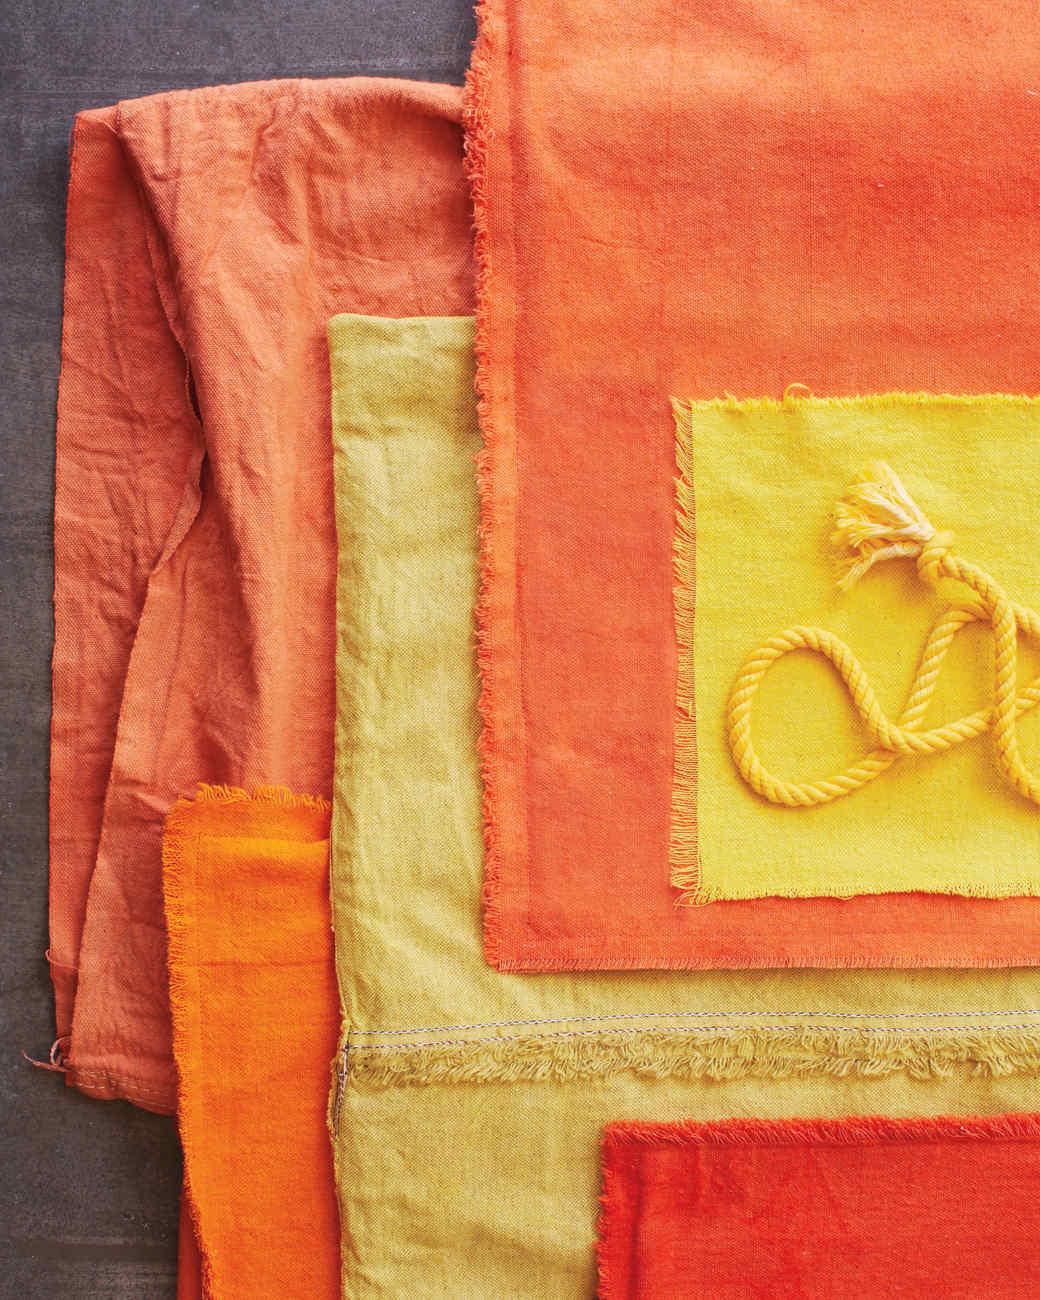 Drop cloth curtains dyed - Drop Cloth Curtains Dyed 53